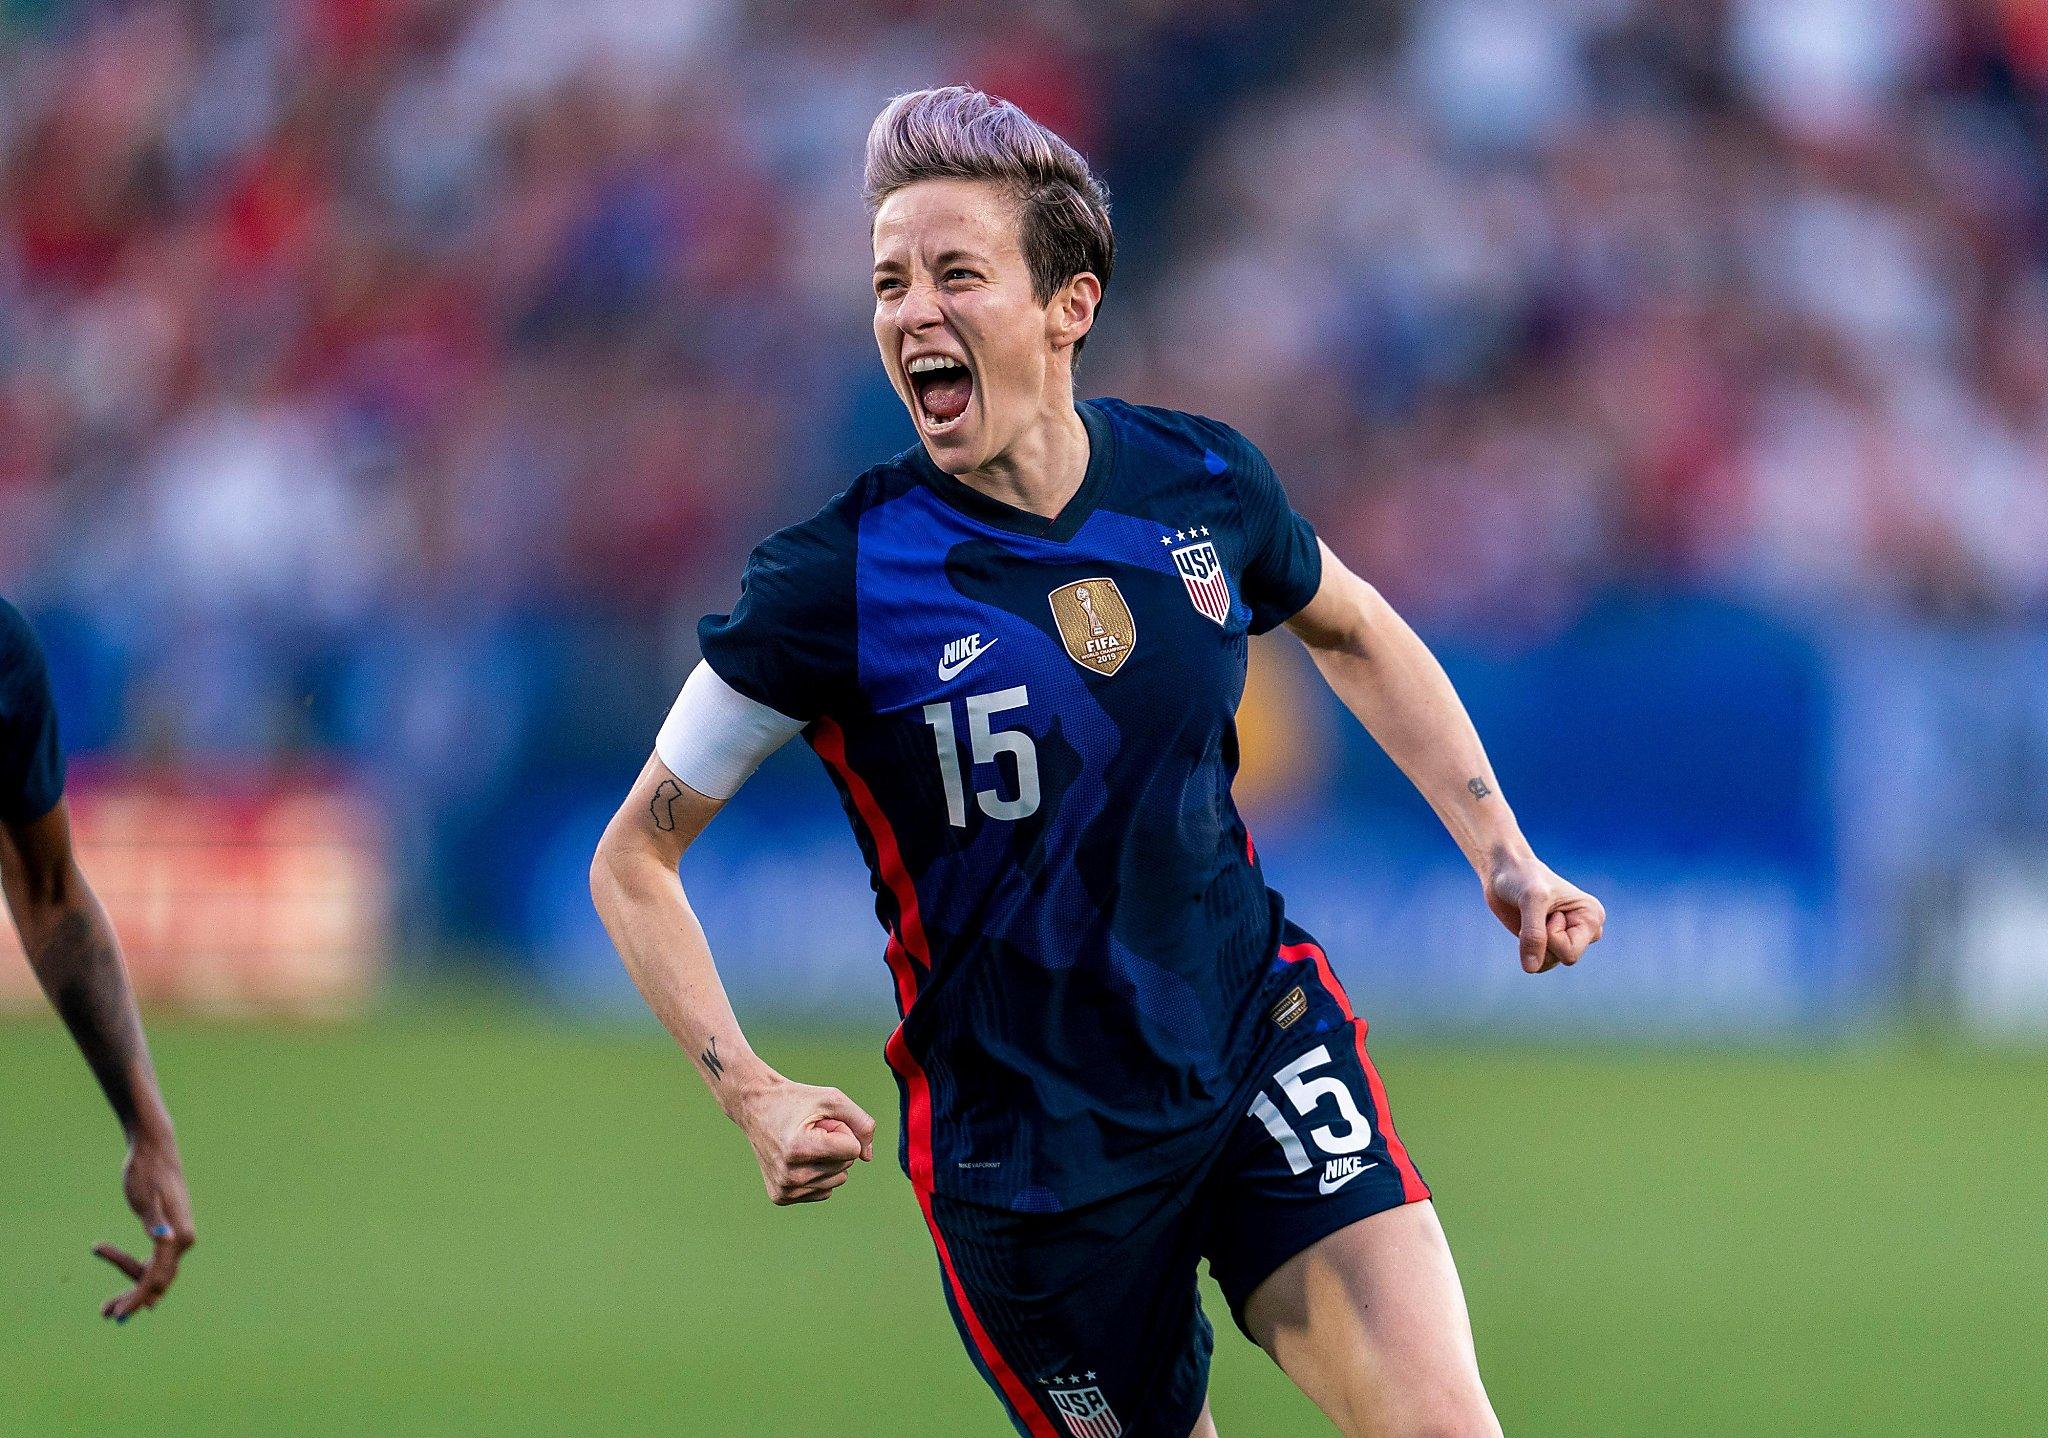 U.S. women's national soccer team begins camp